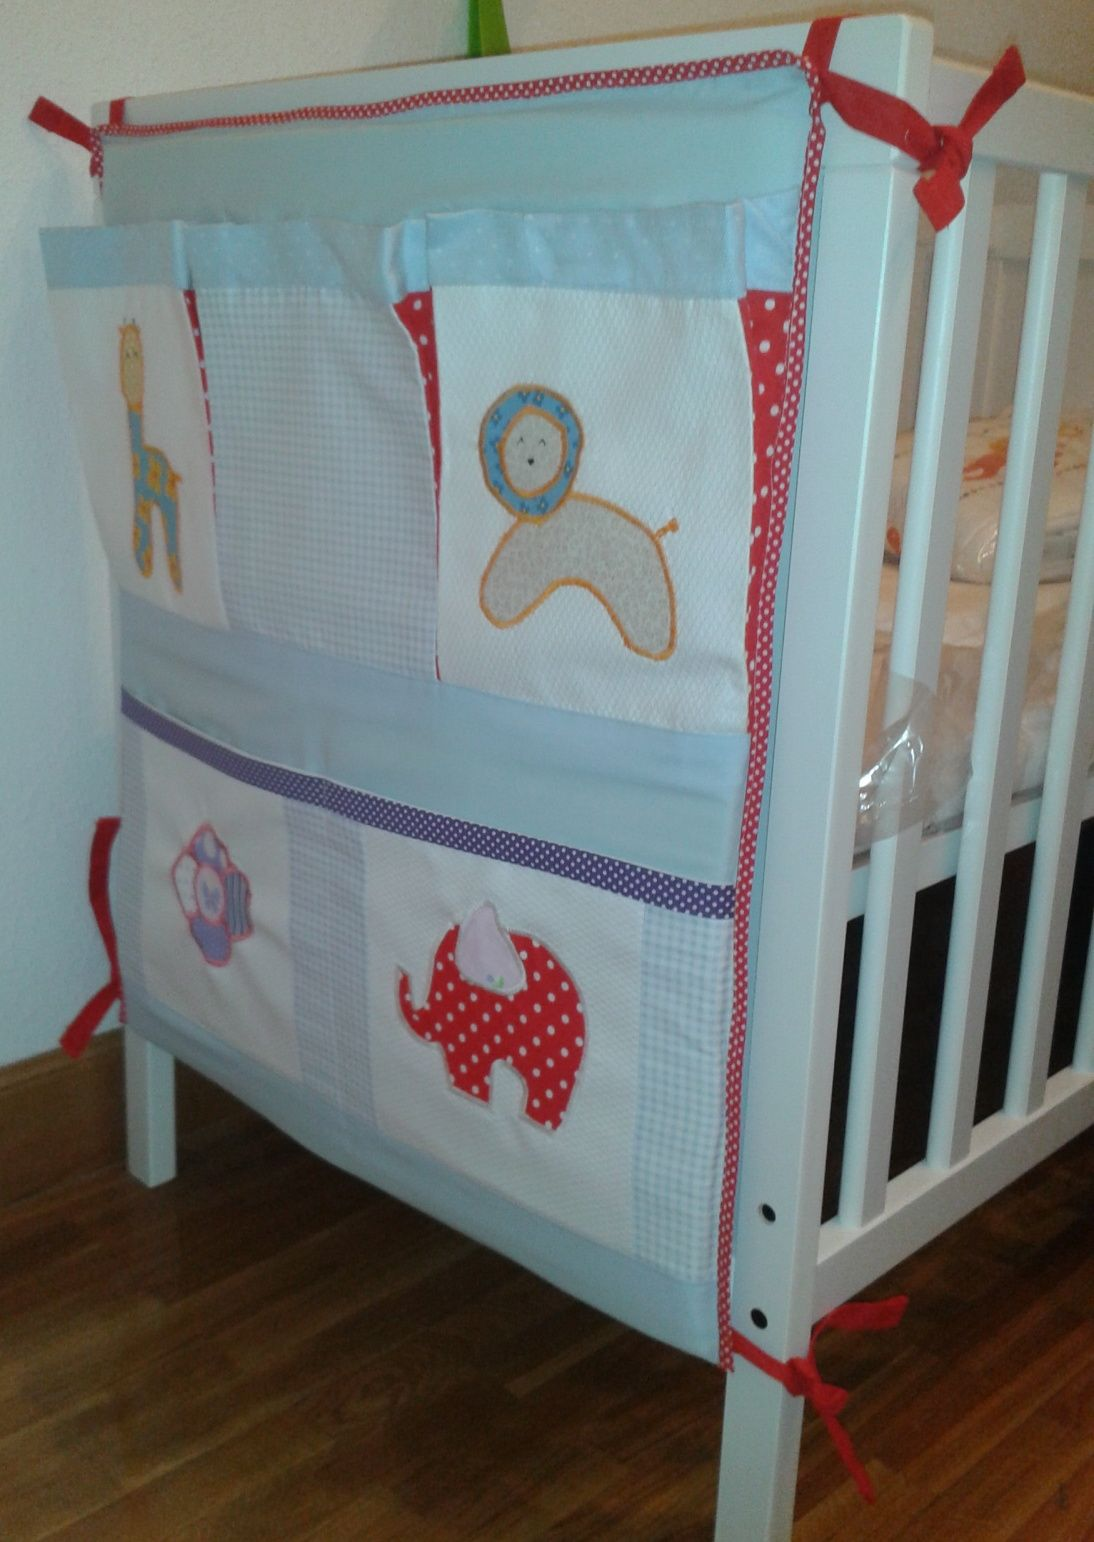 Tutorial bolsillero para cuna de beb organizador para cuna de beb tutorial baby organizer - Organizador de cuna ...